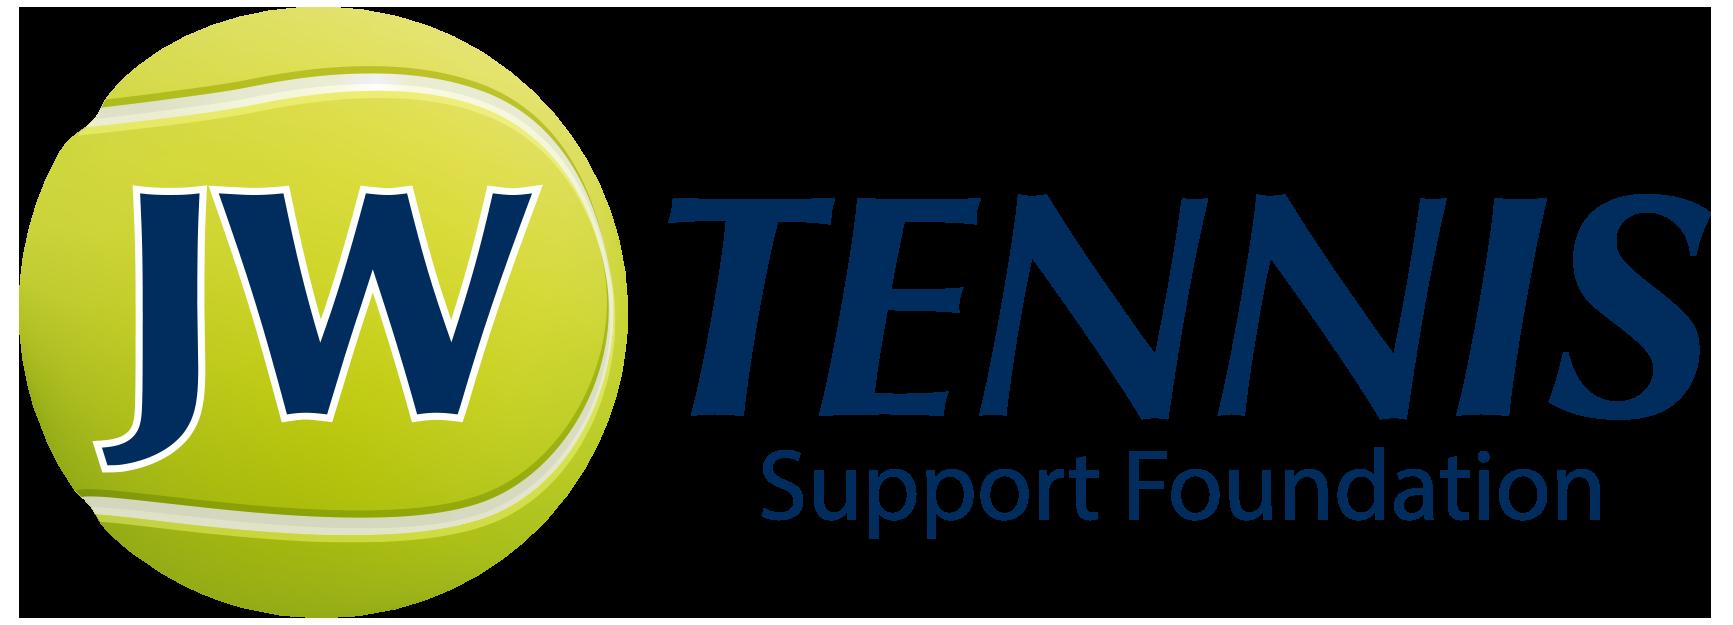 logo JW tennis